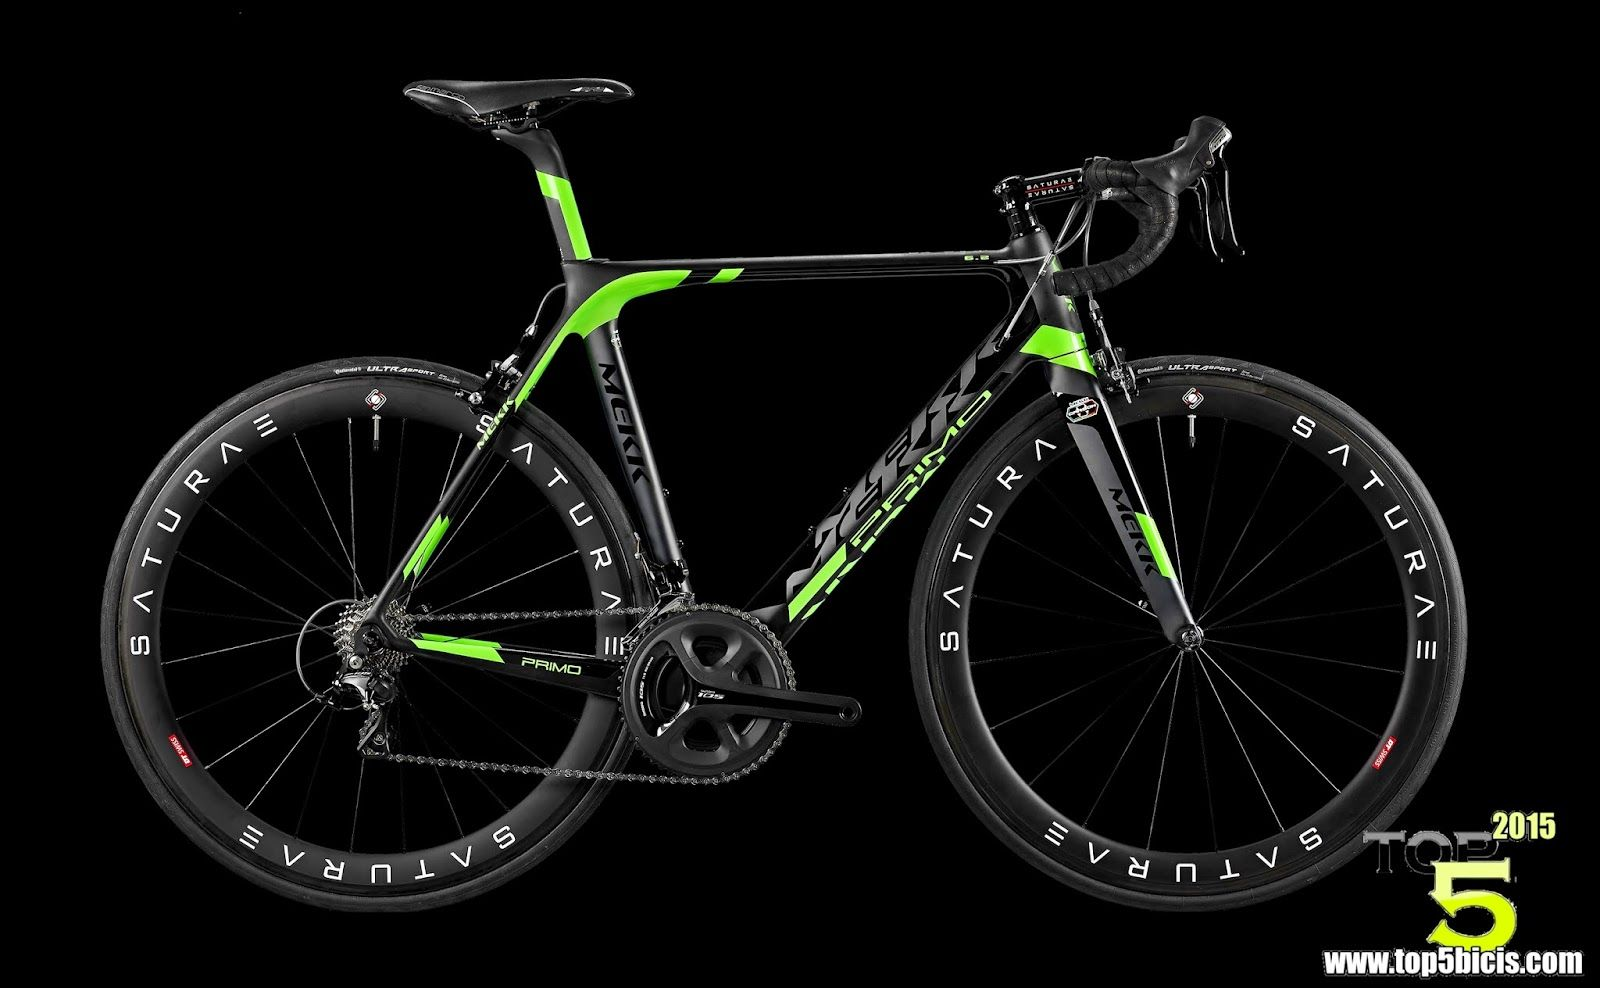 Mekk Primo, nueva marca en top5bicis | Bicicleta de carretera ...